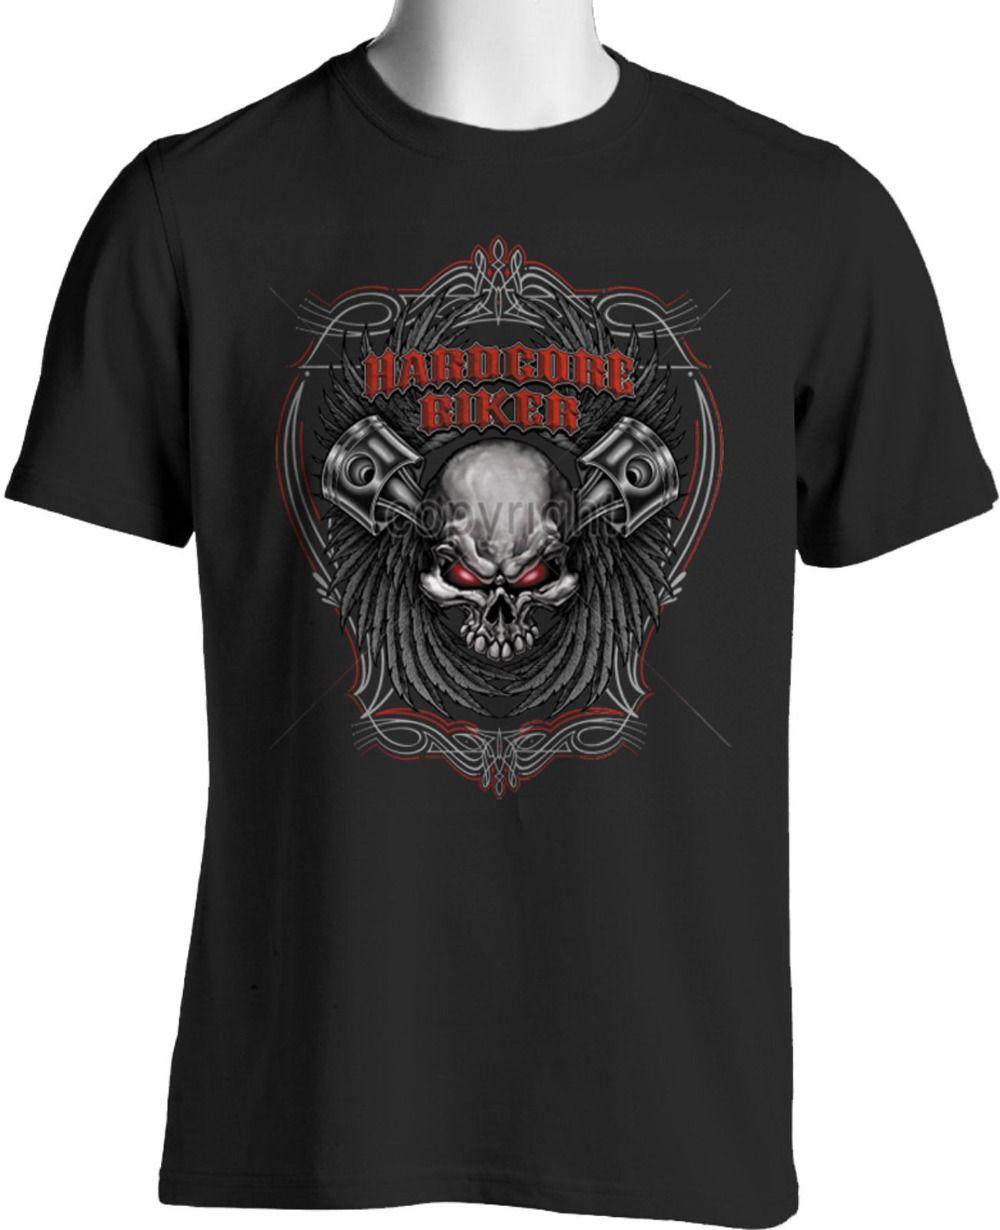 cac72415c90 Hardcore Biker T-Shirt Skull Wings Pin StripesSize S To 3XL Big And ...